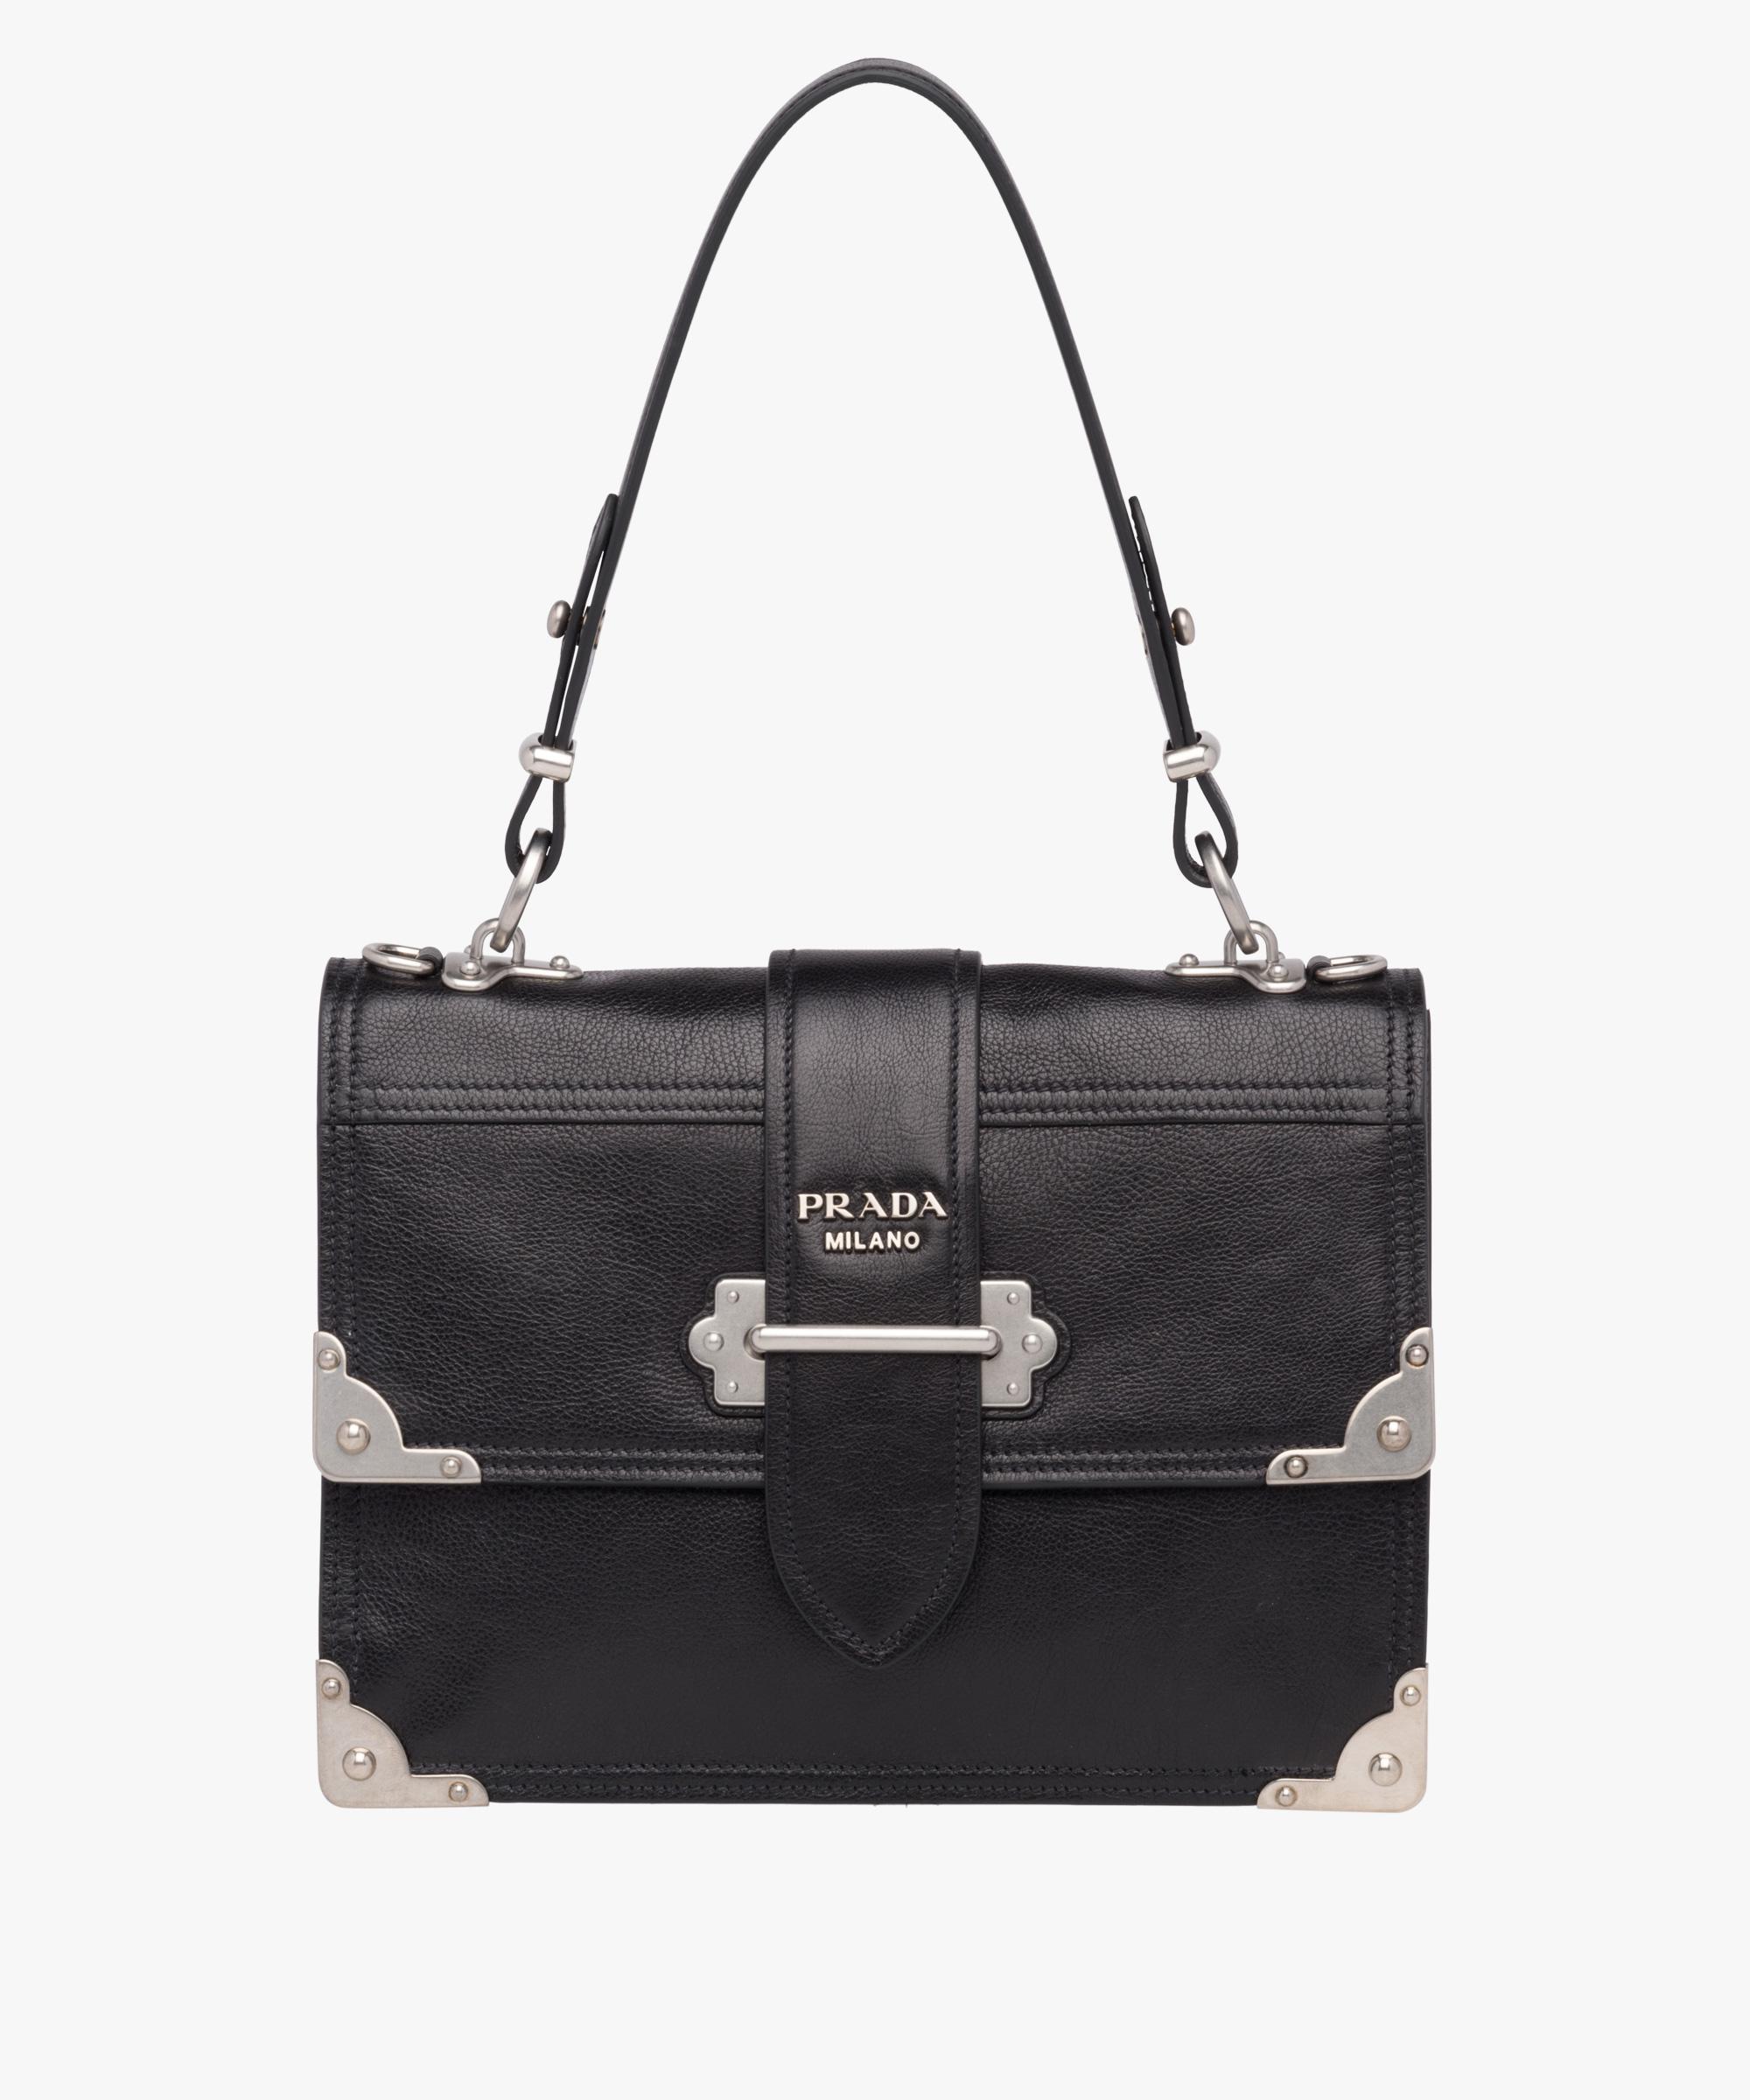 3130dfad8a094d Prada Cahier Printed Leather Handbag in Black - Lyst